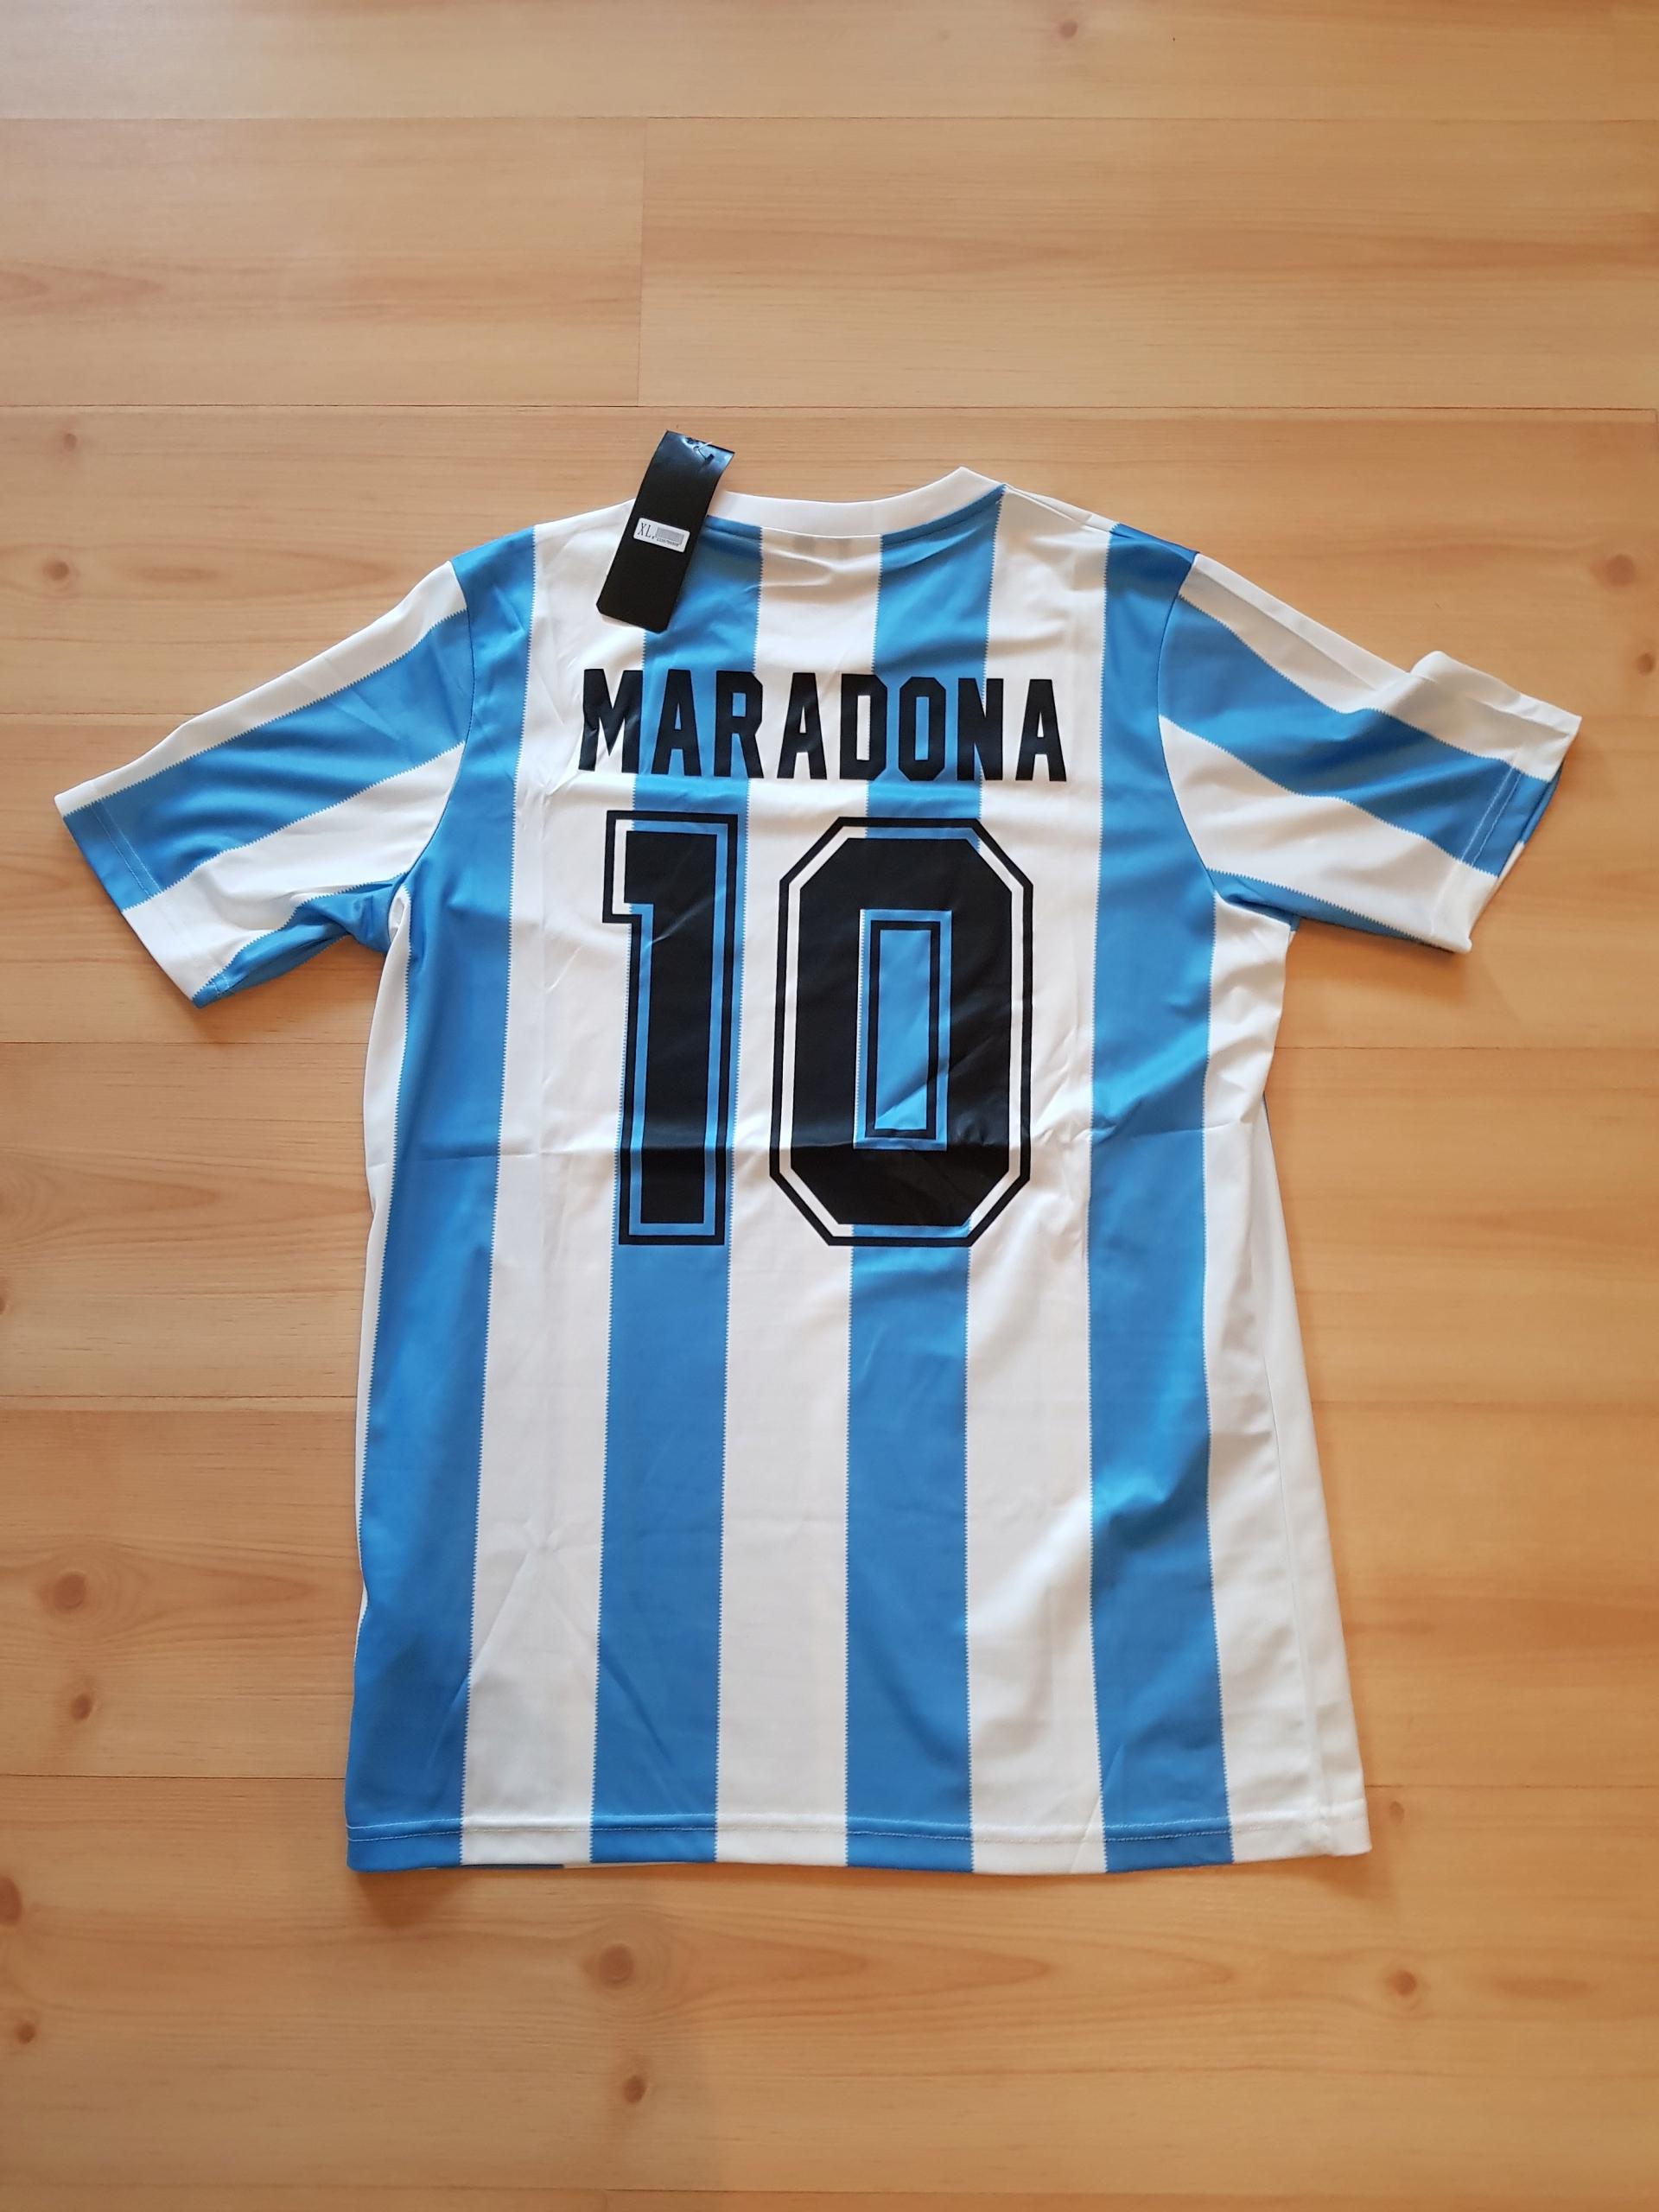 Argentína 1986 tričko Retro replika Maradona 10